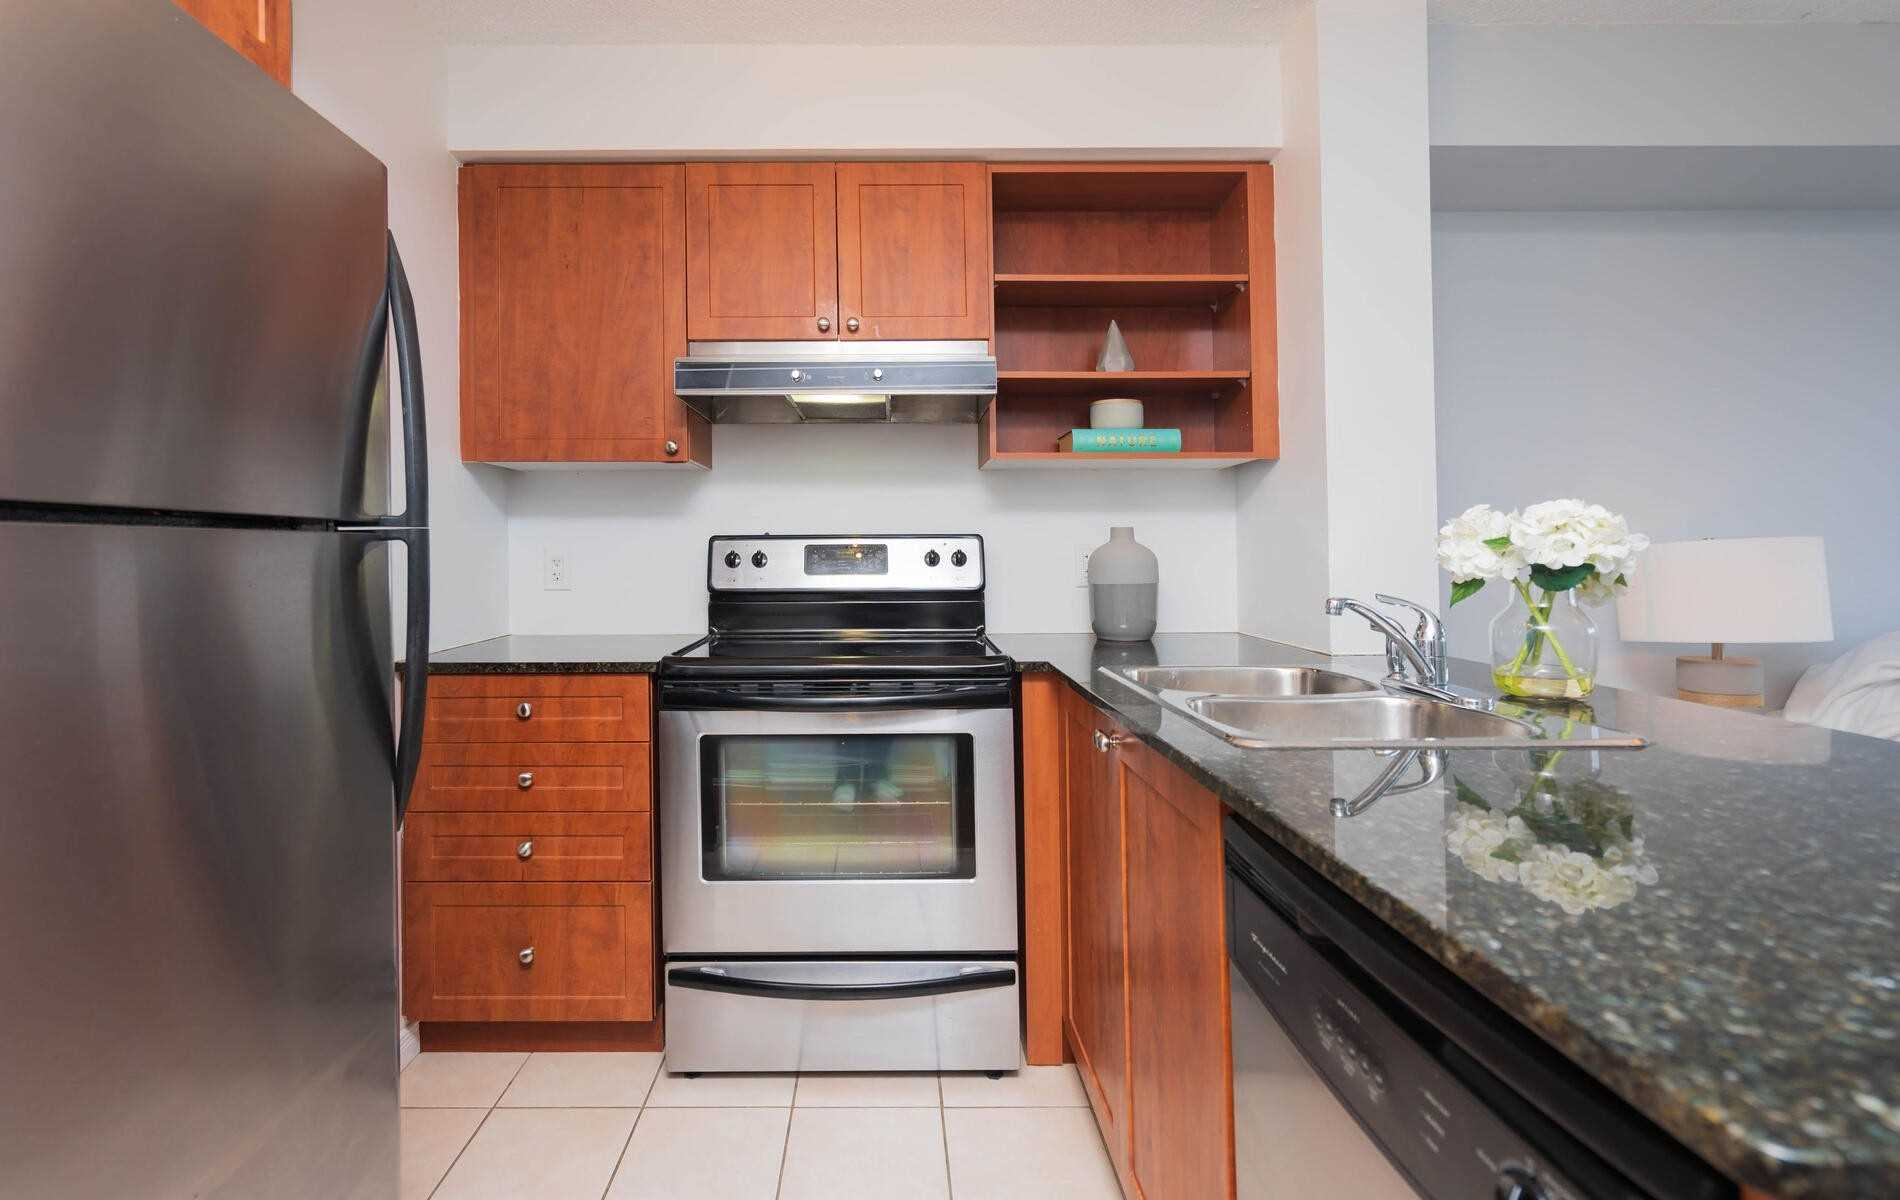 120 Dallimore Circ. 402 - Kitchen